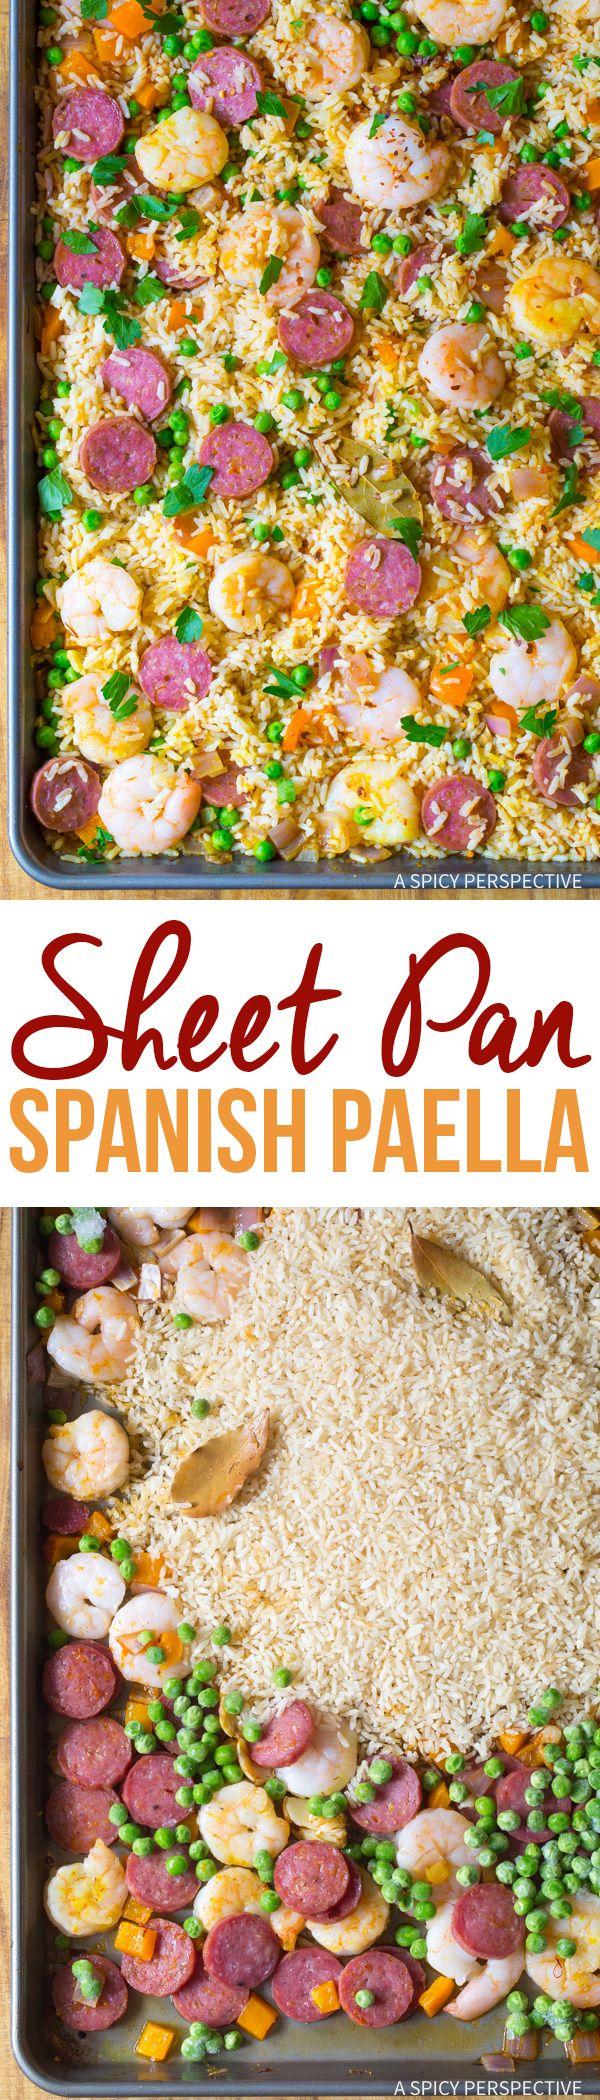 Easy Spanish Paella Sheet Pan Dinner Recipe #healthy #light via @spicyperspectiv